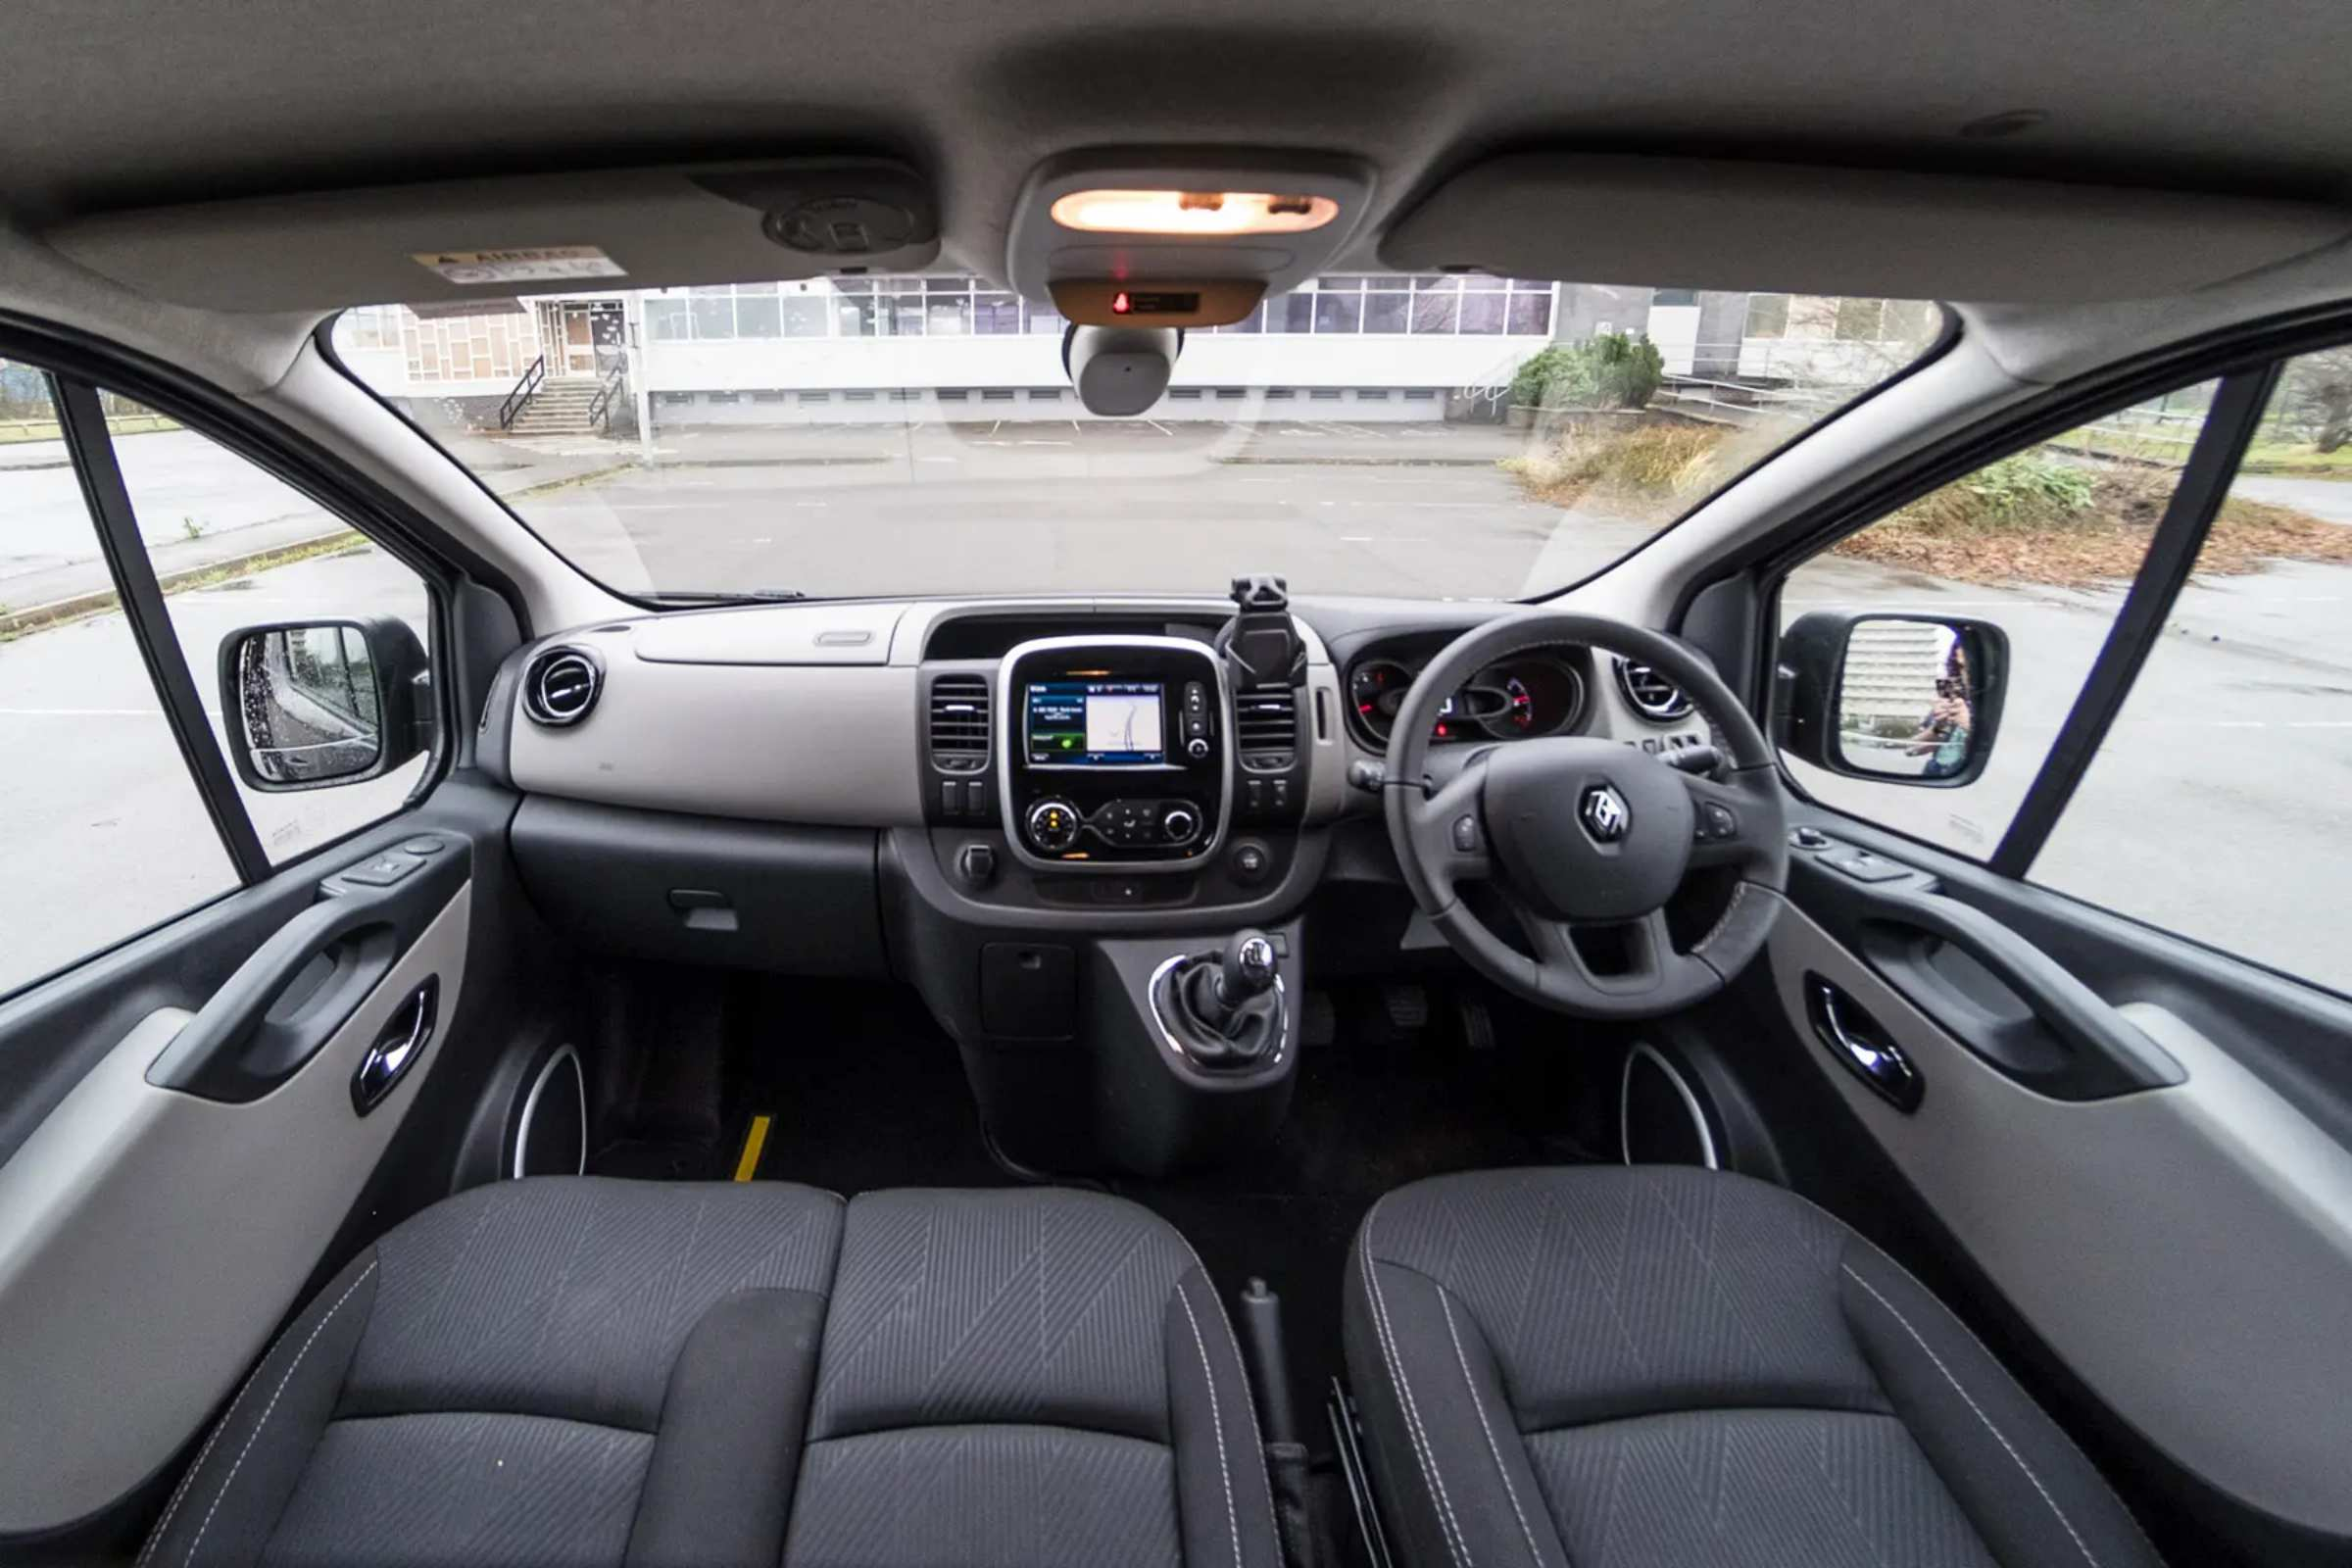 2020 Renault Trafic auto 3 interior